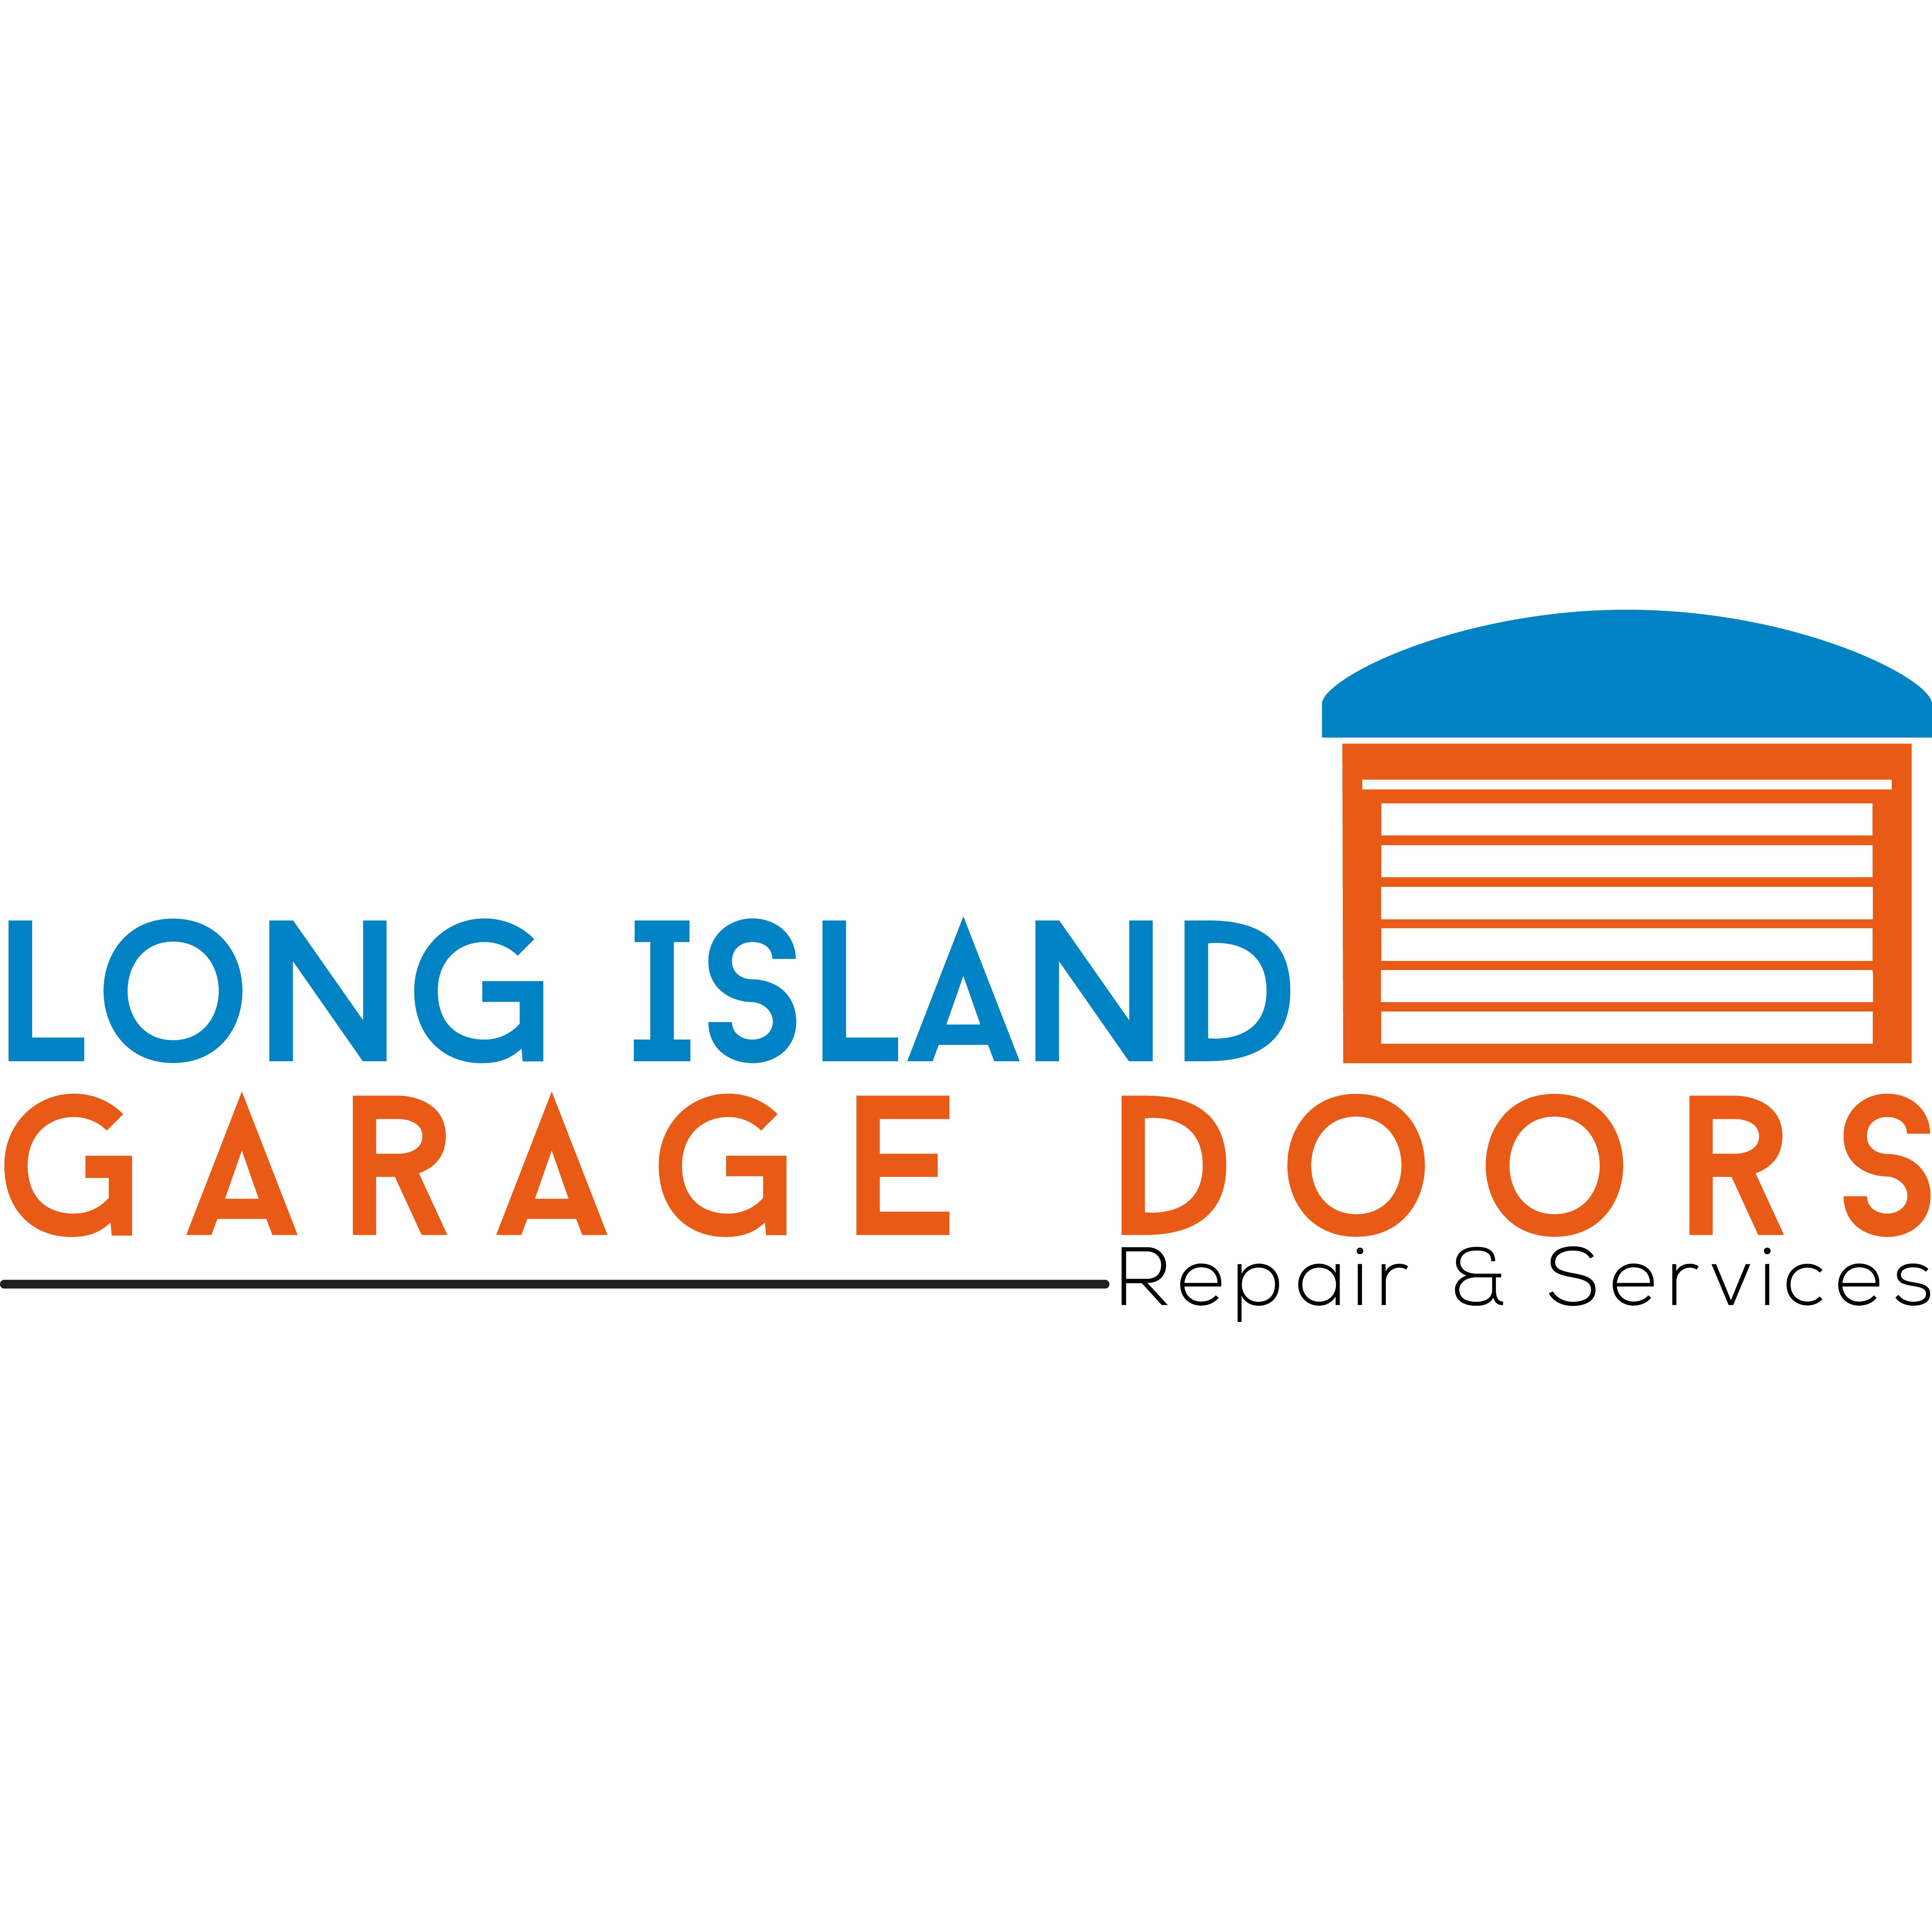 Long Island Garage Doors Repair & Services image 8